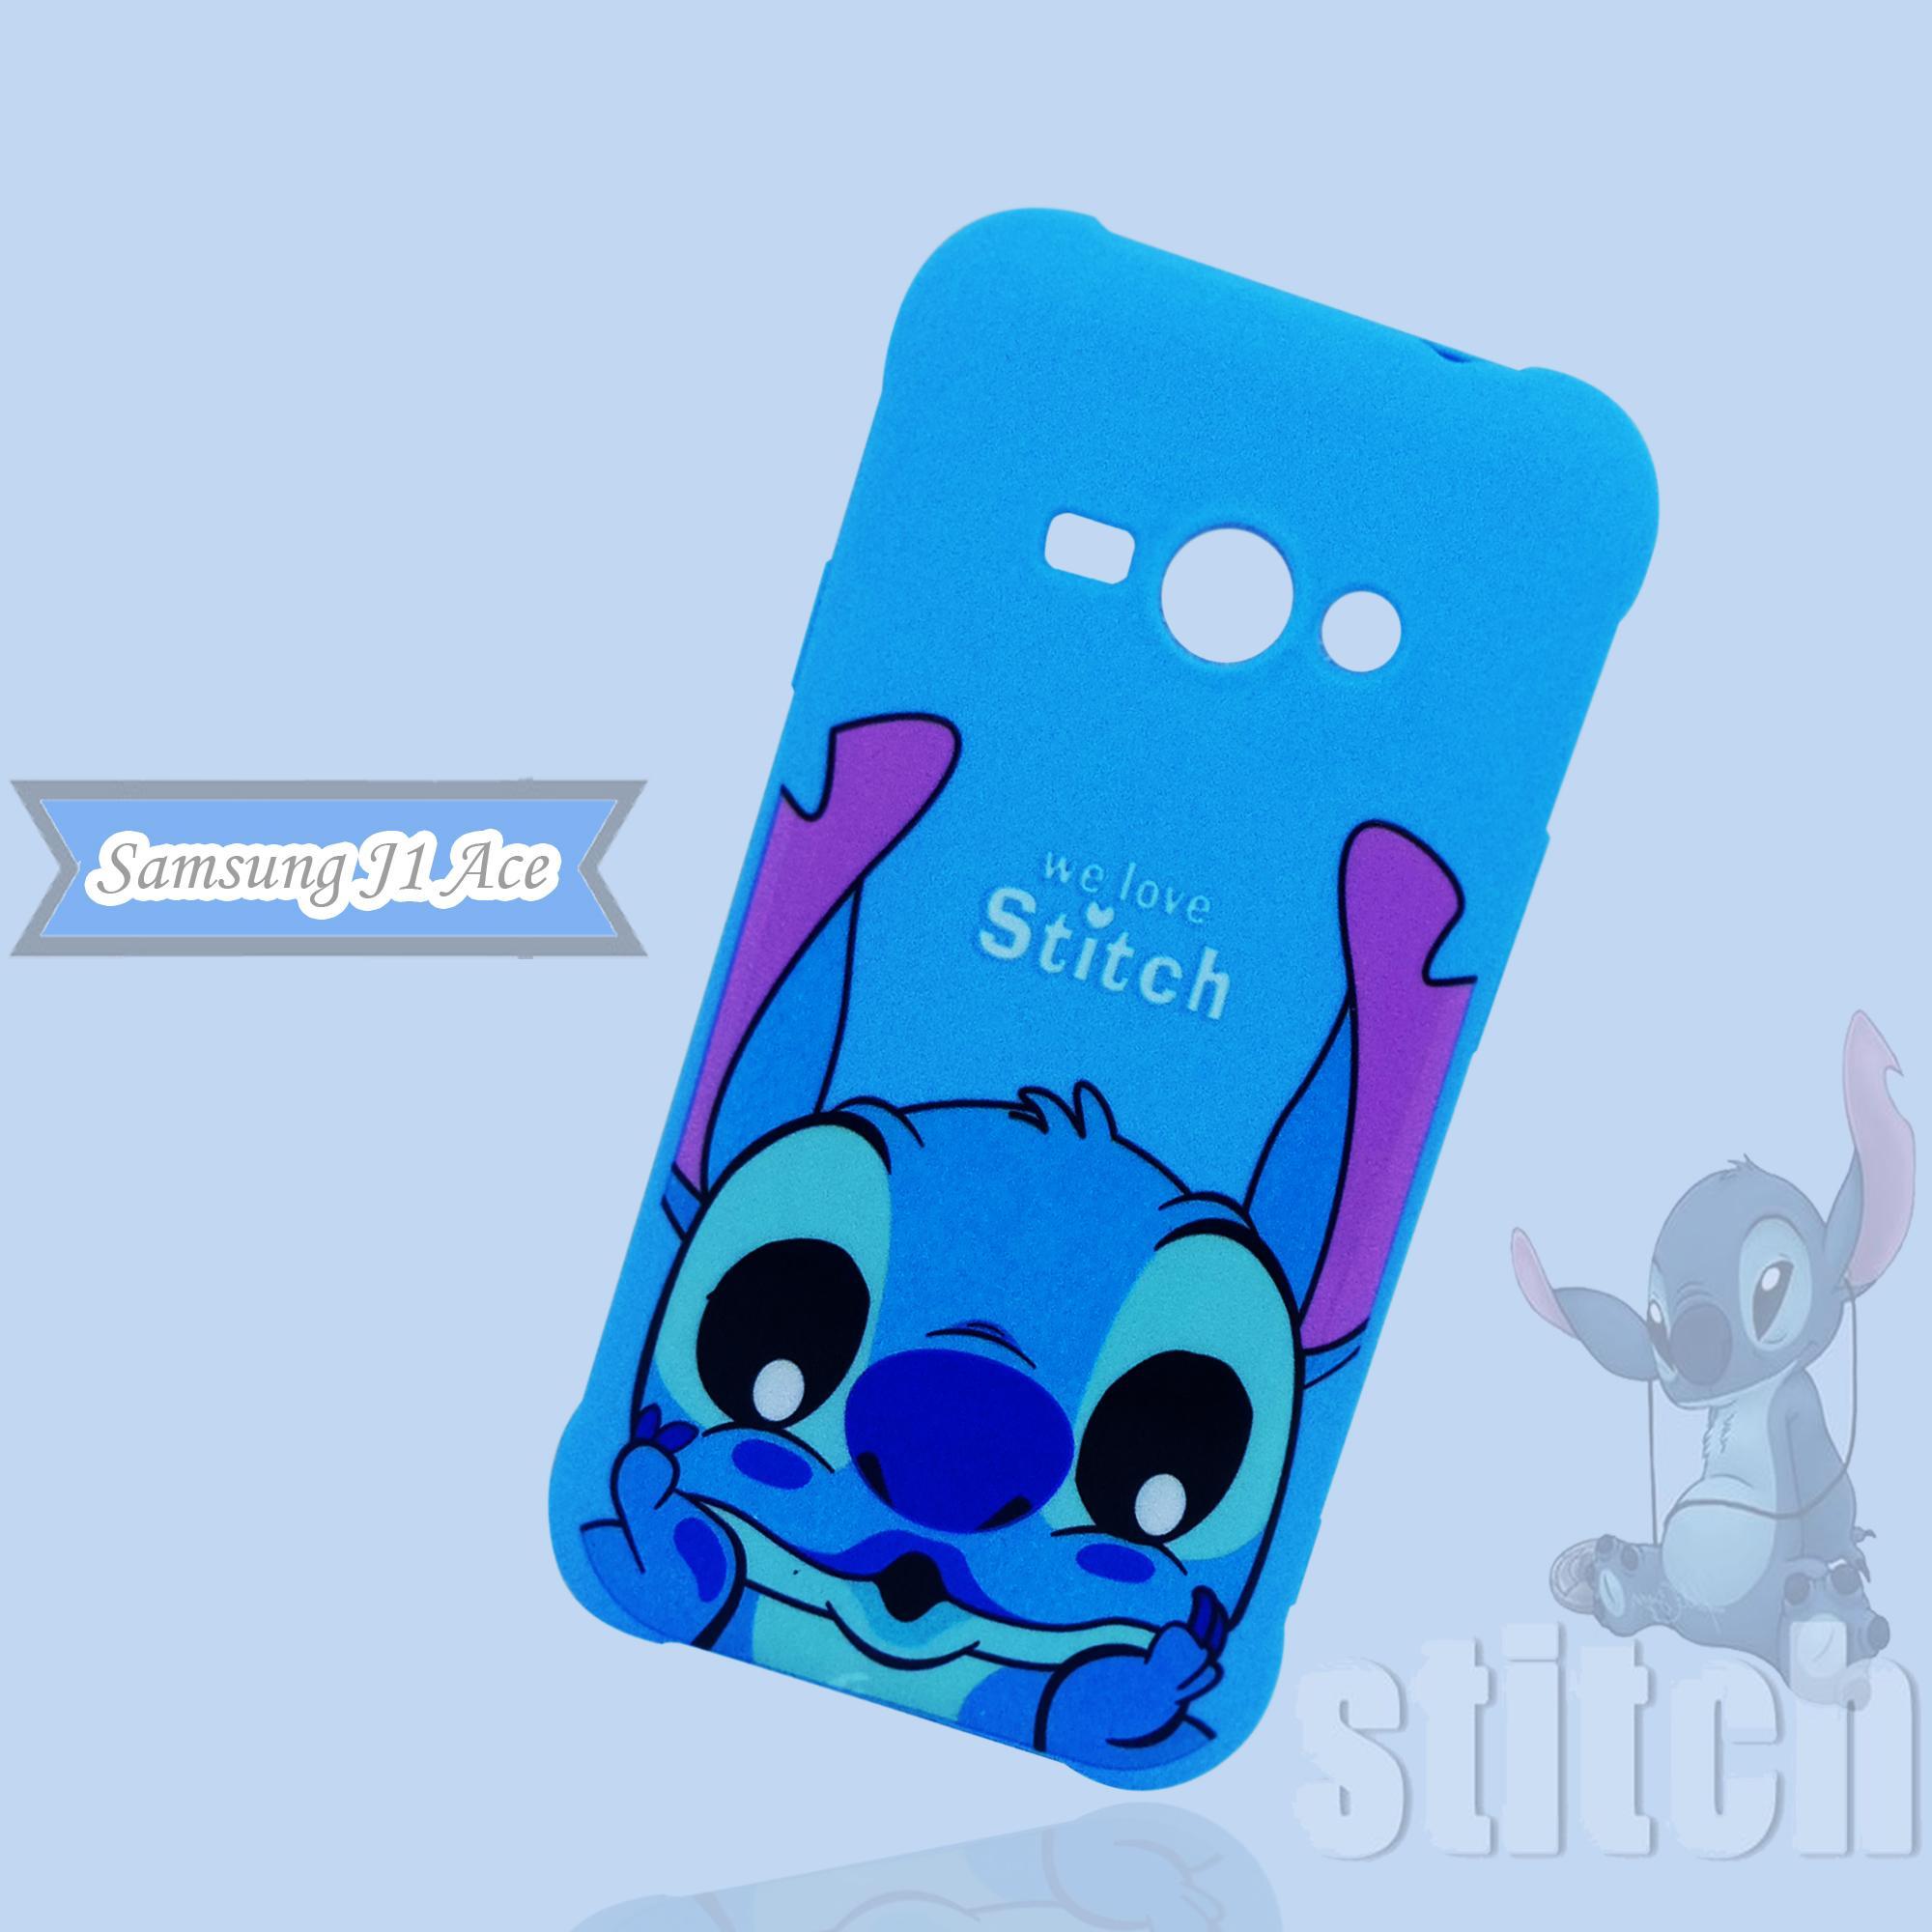 Softcase Fashion Stitch Phone Case New For Samsung Galaxy J1 Ace